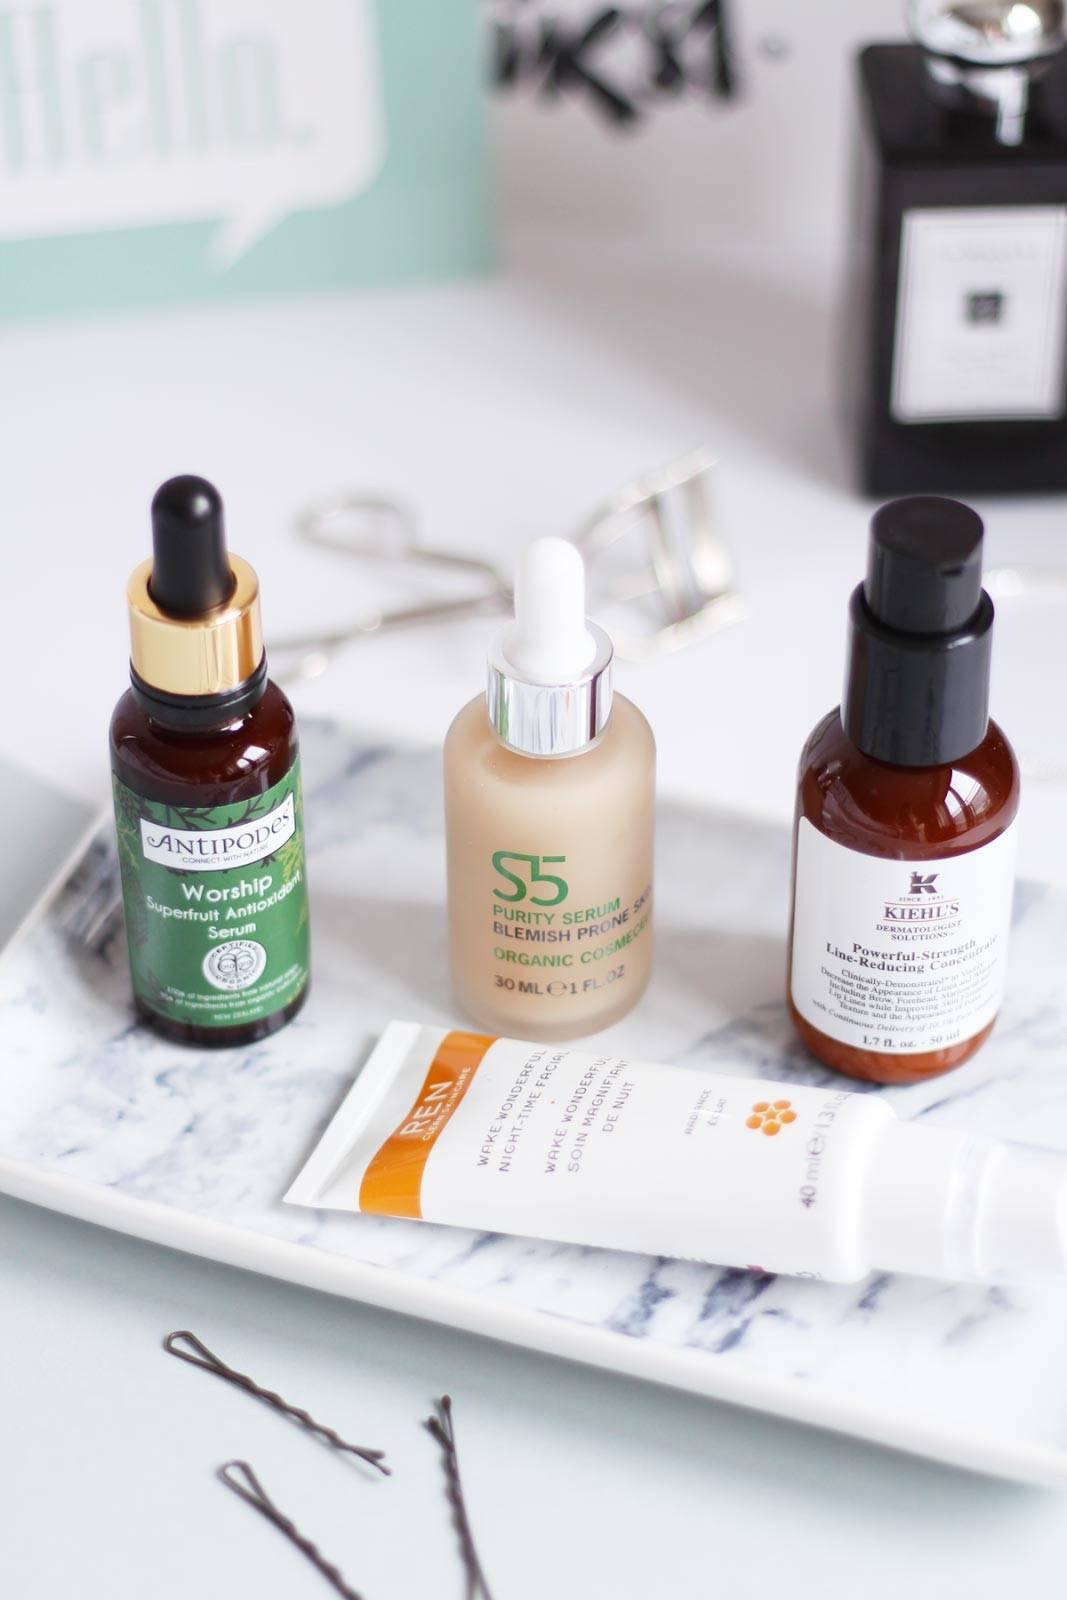 brightening-skin-treatments-antipodes-worship-ren-wake-wonderful-s5-purity-serum-kiehls-line-reducing-concentrate